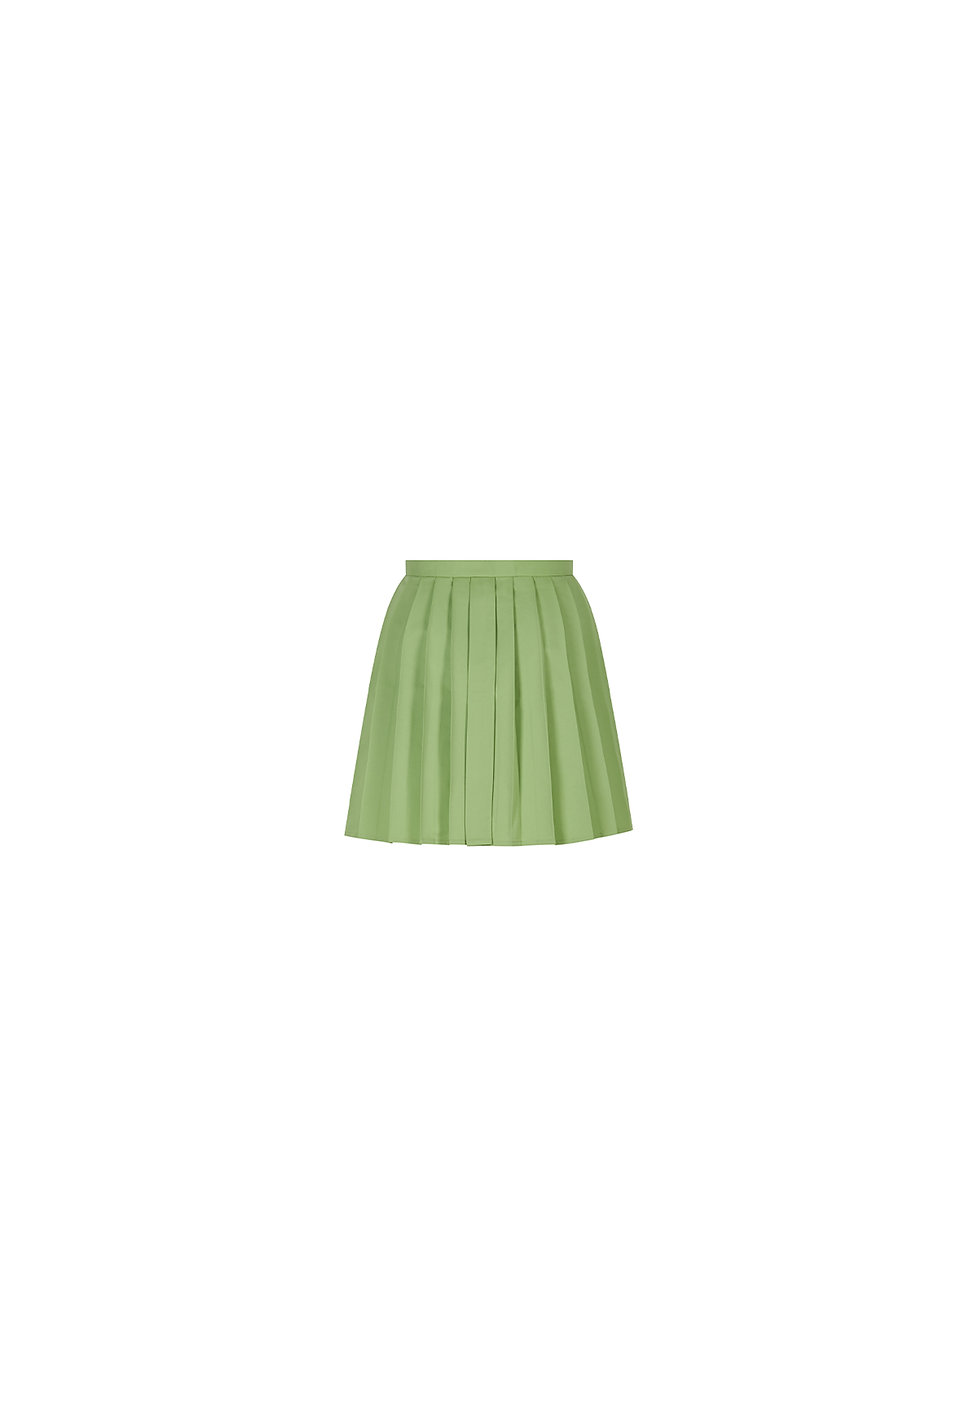 VOL1872 Green Mini Kilt Skirt B.jpg